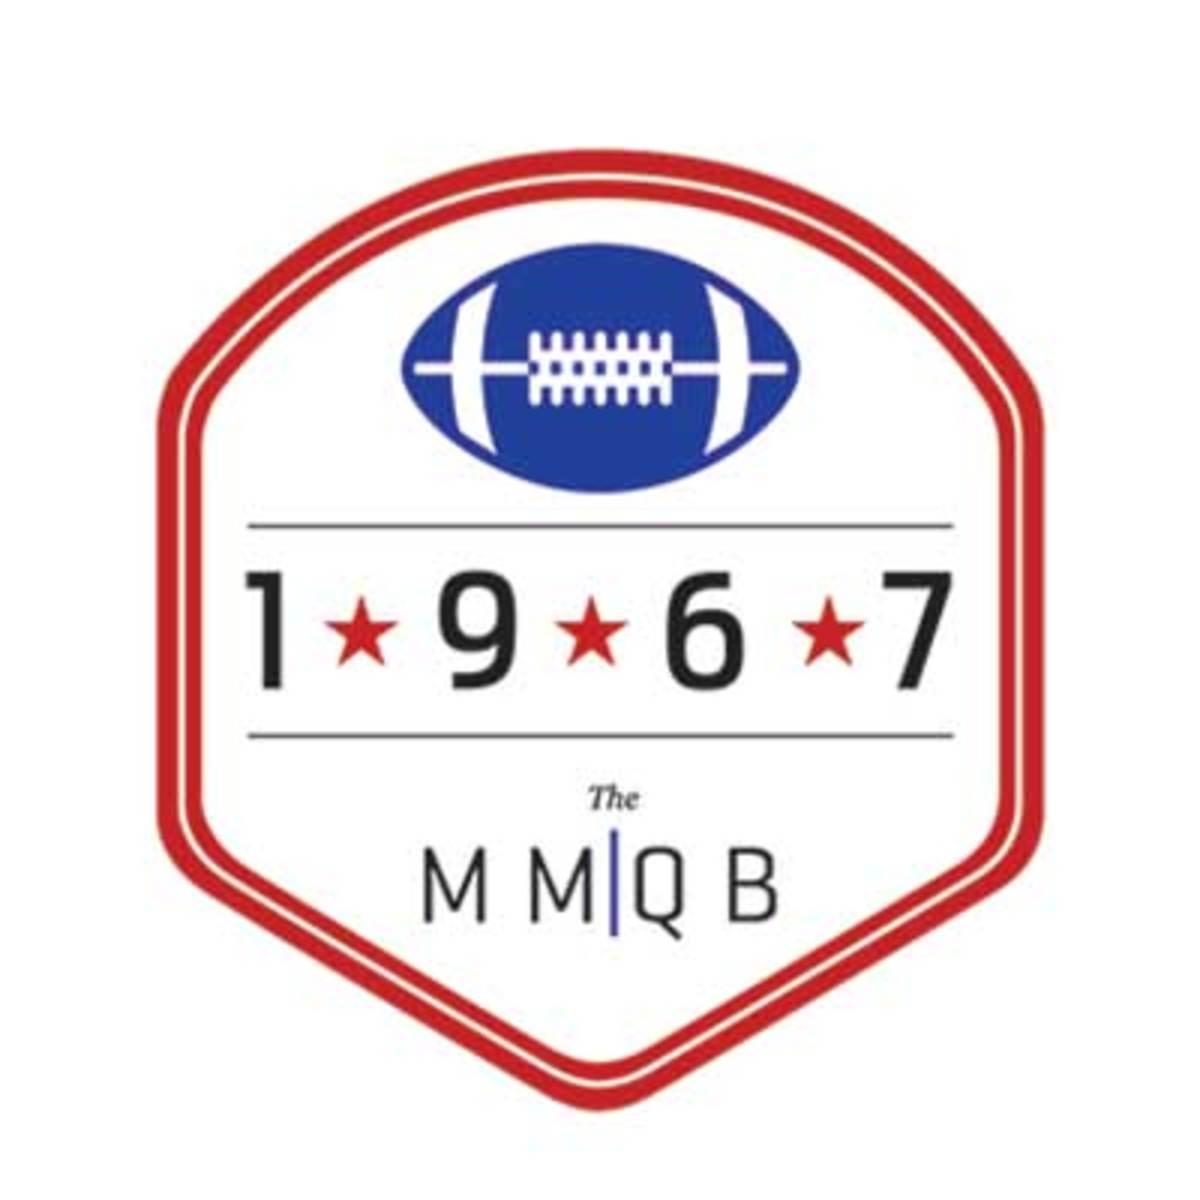 1967-mmqb-logo-400.jpg